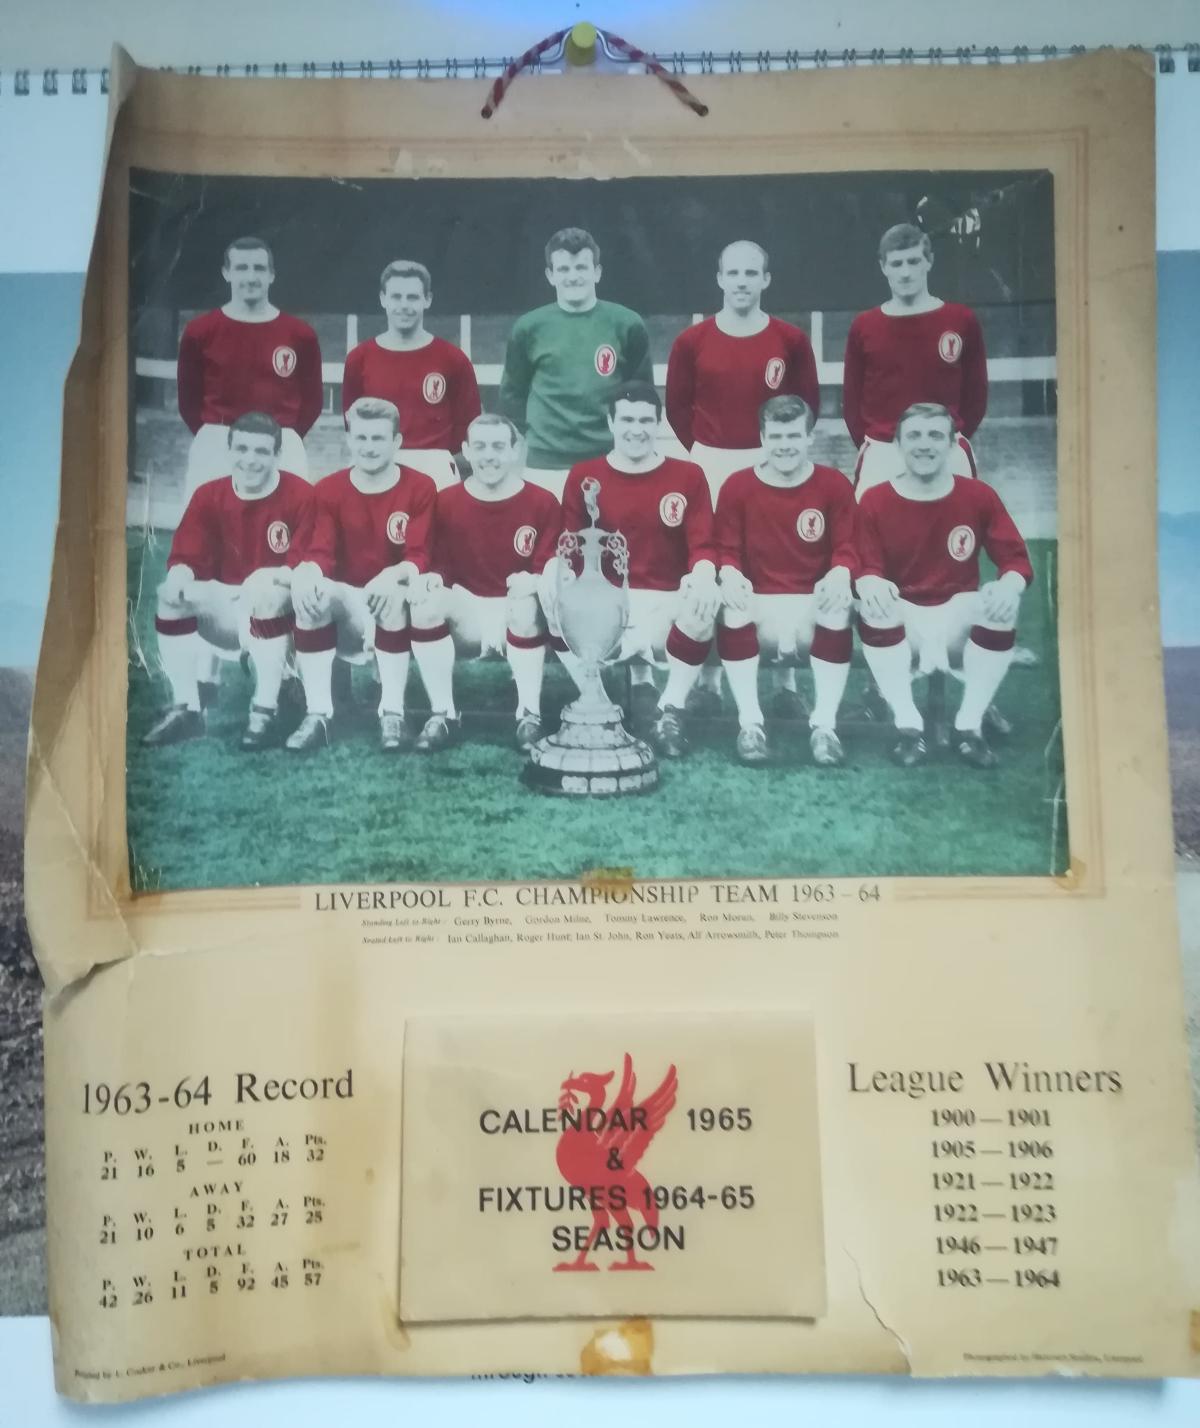 Liverpool FC calendar 1965